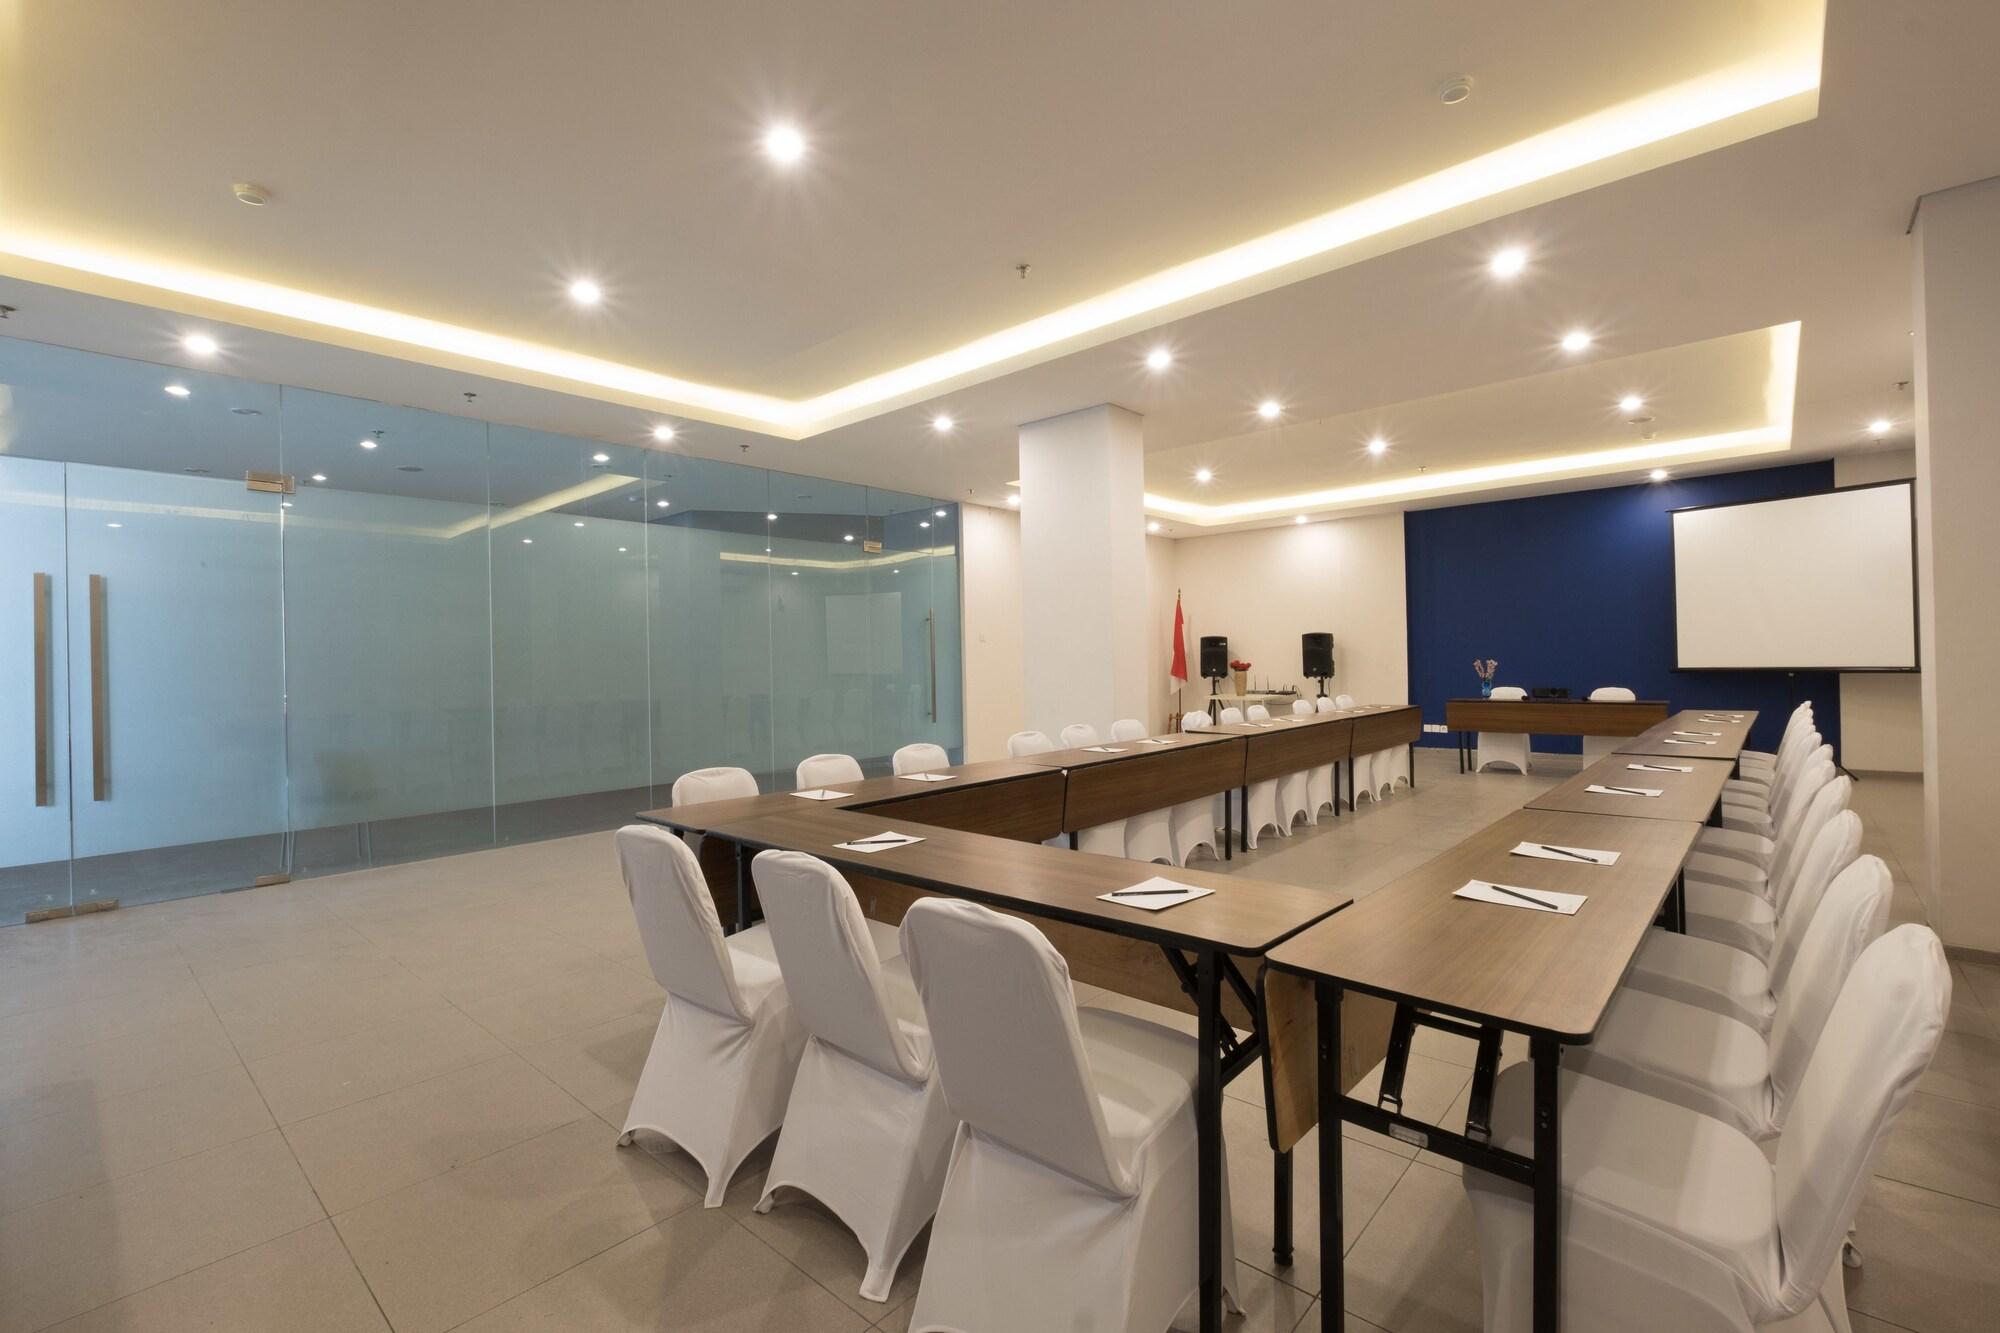 Hotel 88 Bekasi,Bekasi Timur